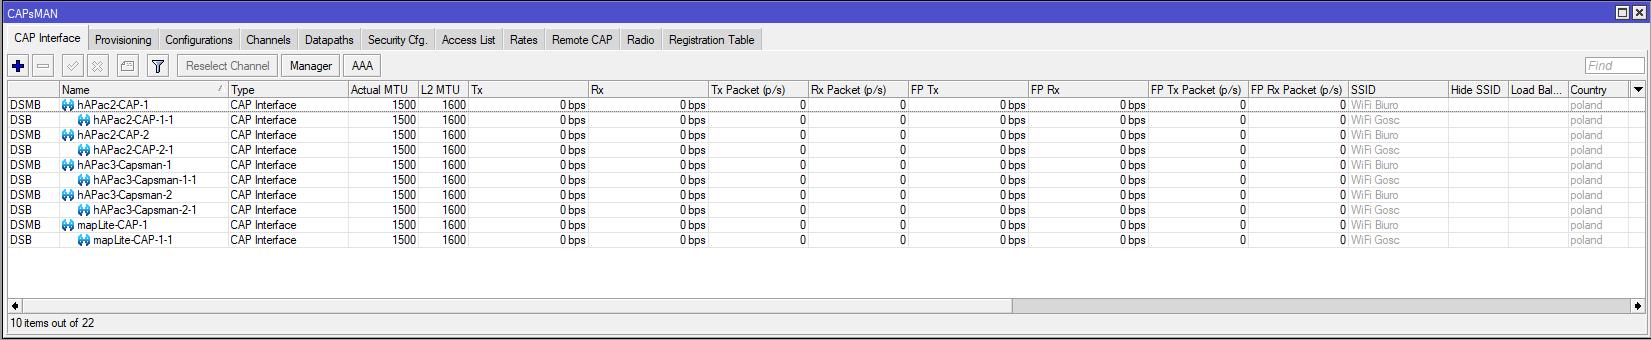 Mikrotik Capsman Interfaces List